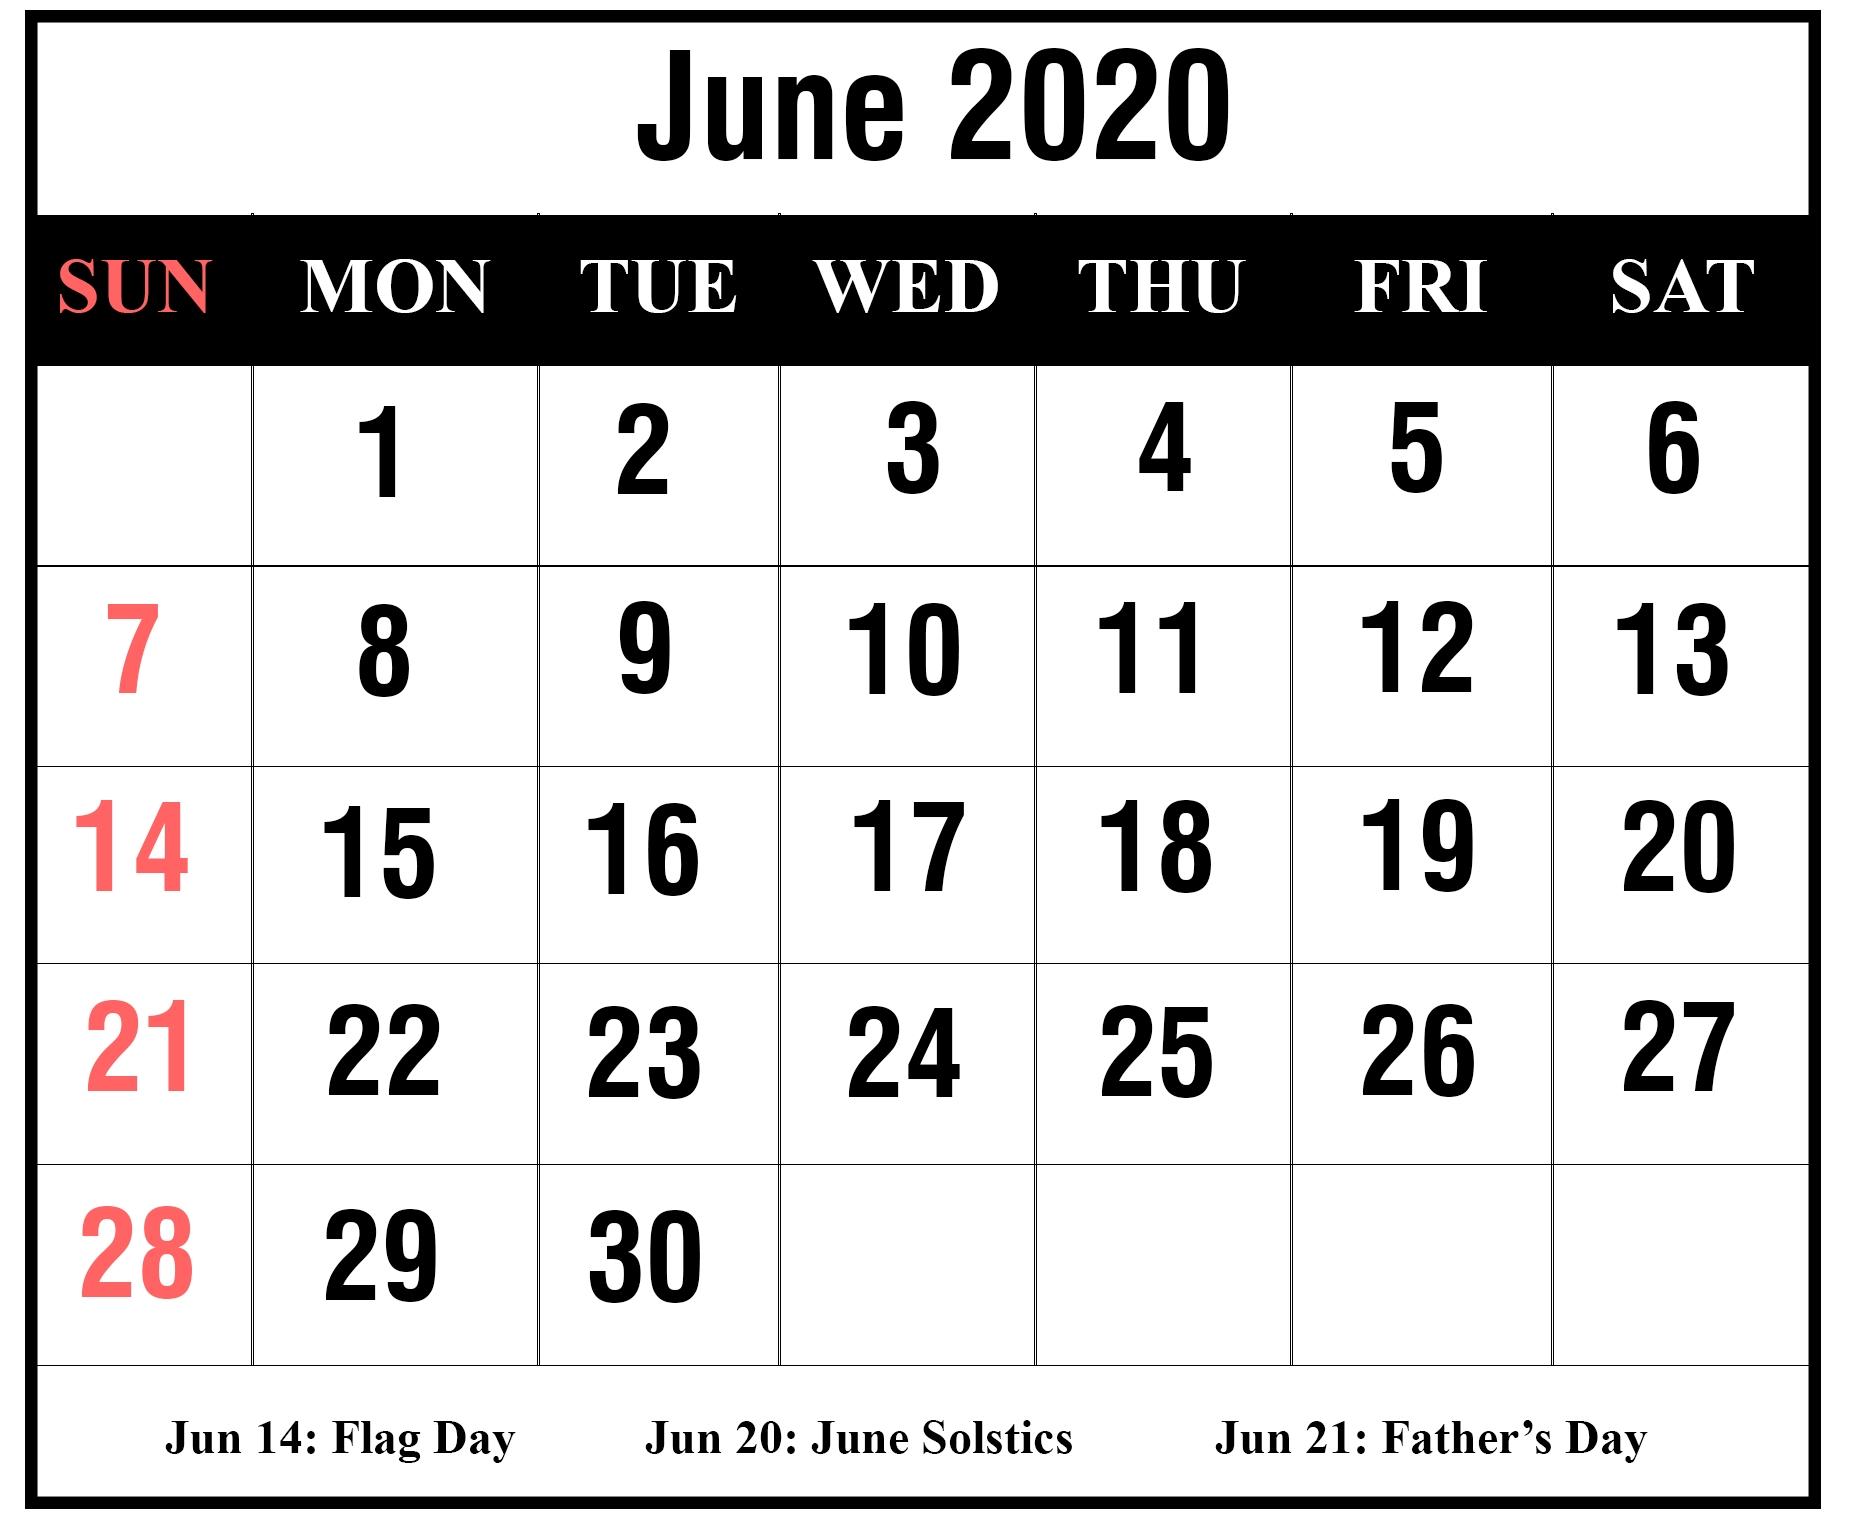 Free Printable Large Numbers Calendar 2020 | Calendar Template Printable Monthly Yearly-Large Numbers Calendar October